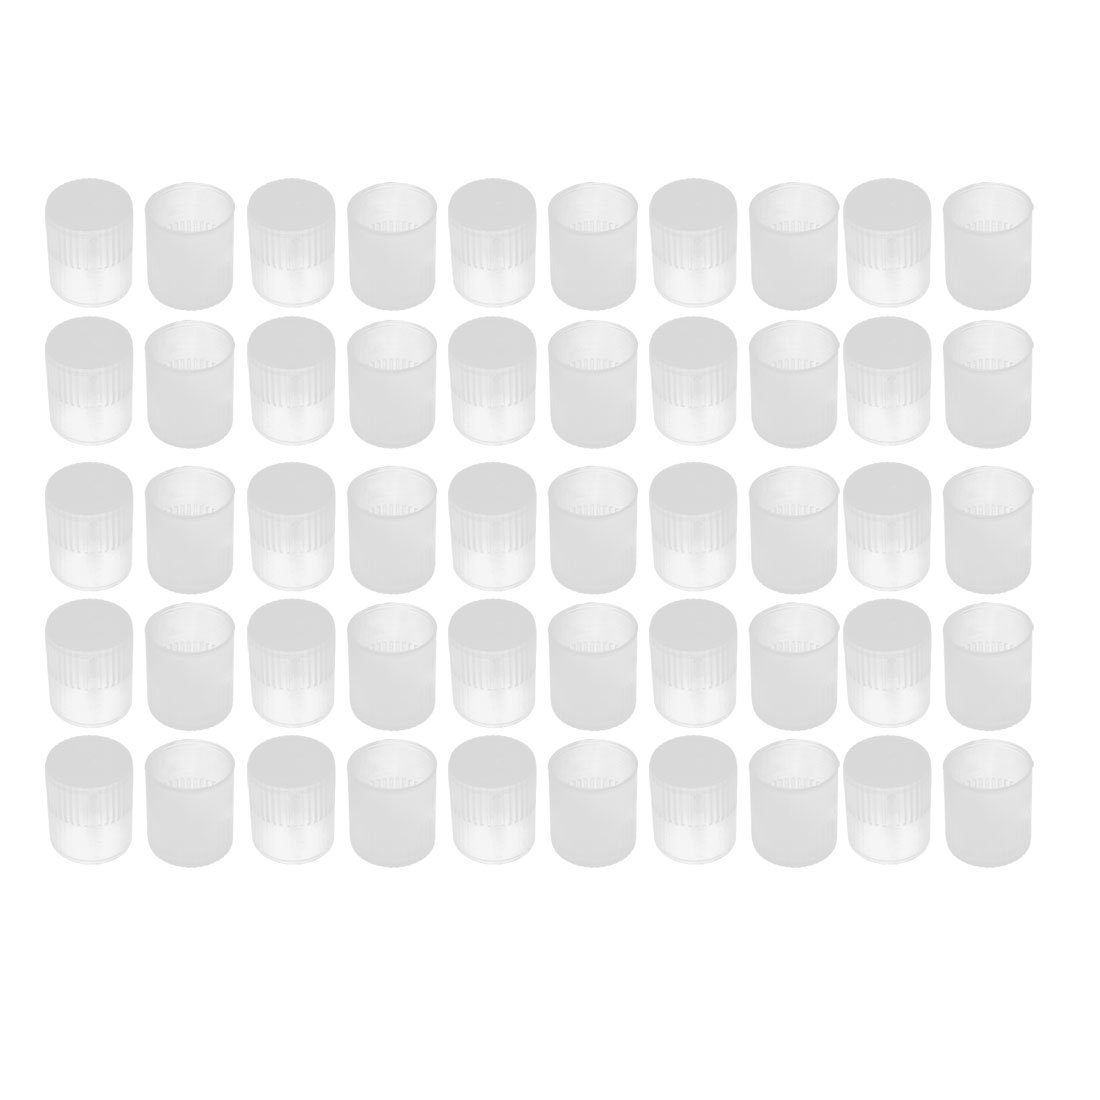 uxcell 50Pcs 12mm Inner Dia PE Plastic End Cap Bolt Thread Protector Tube Cover